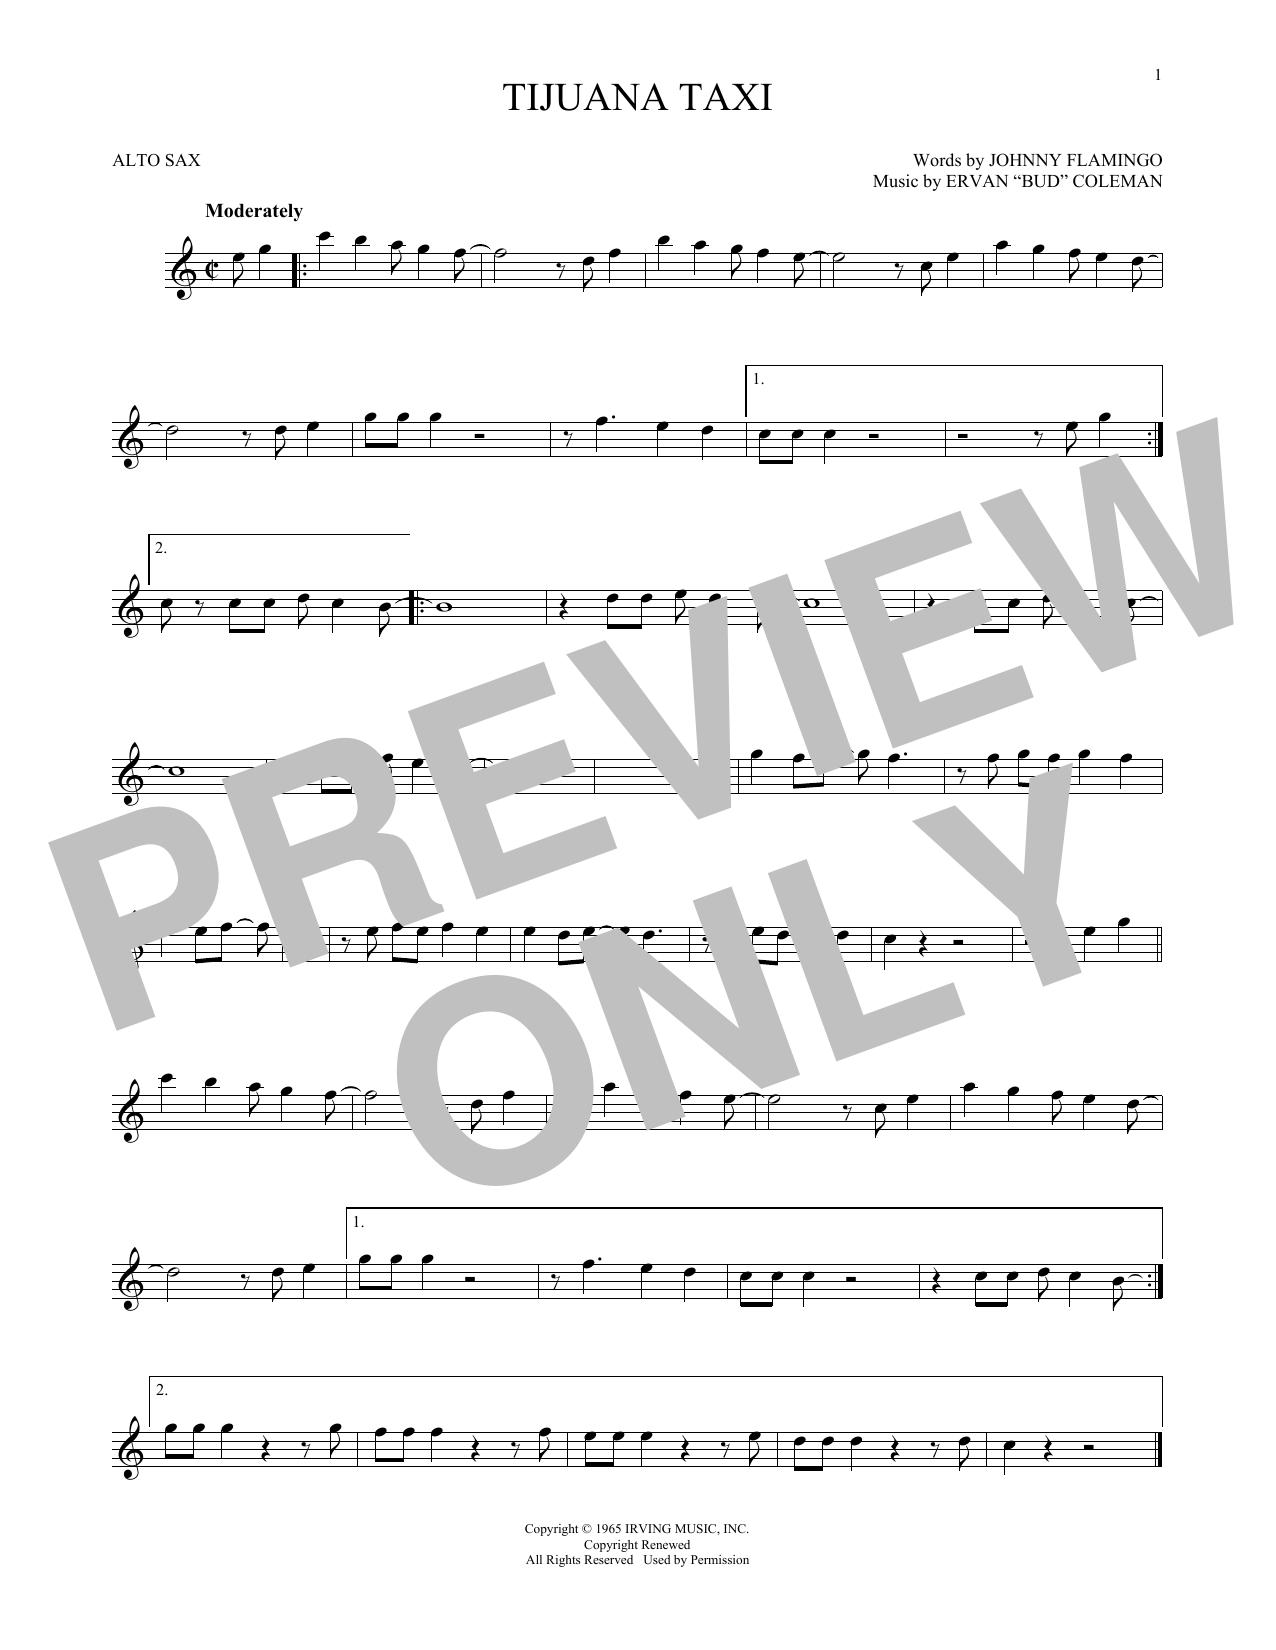 Partition saxophone Tijuana Taxi de Herb Alpert & The Tijuana Brass Band - Sax Alto